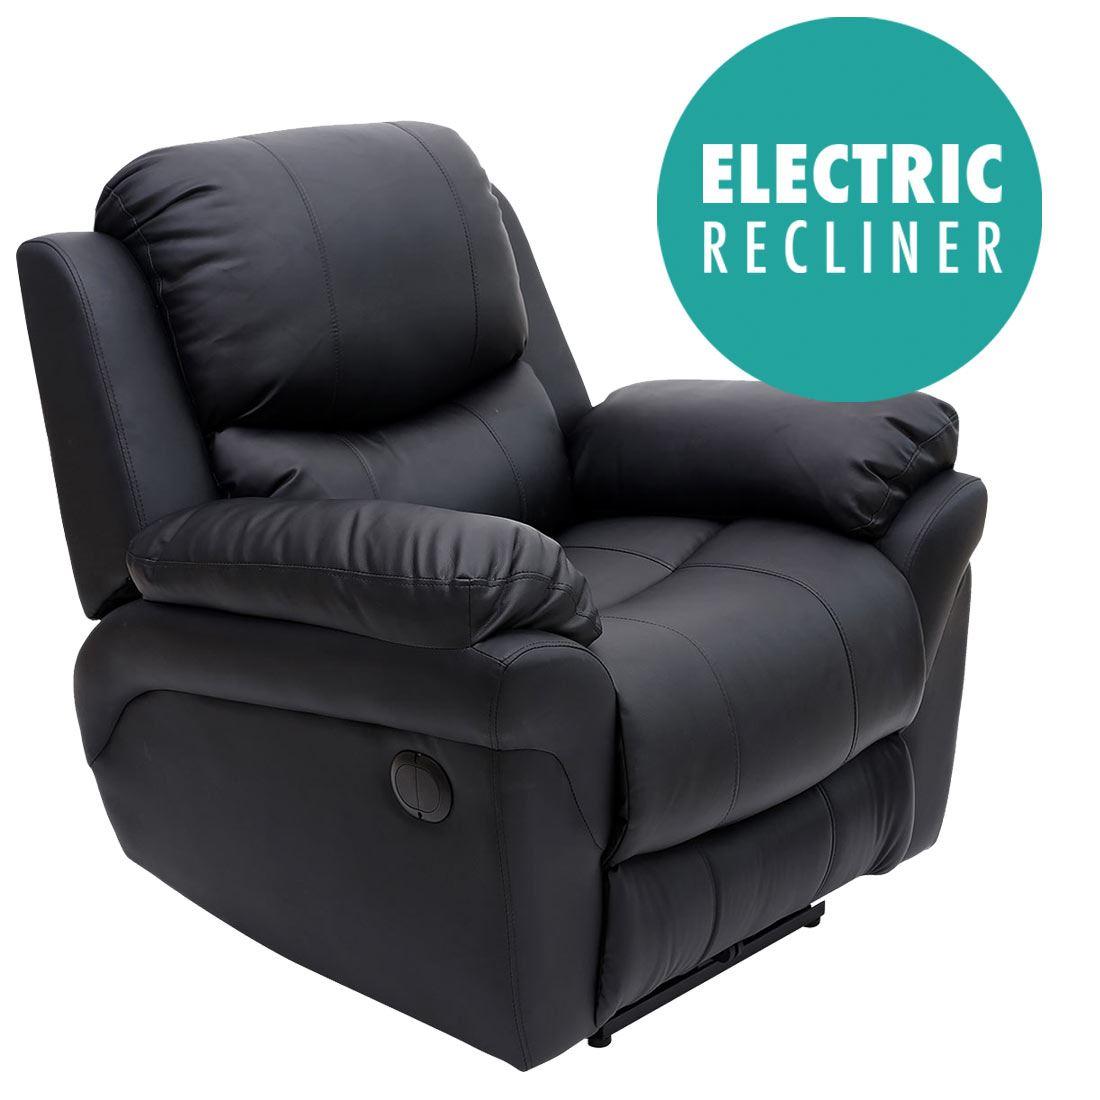 Leather Electric Recliner Sofa Uk: MADISON ELECTRIC REAL LEATHER AUTO RECLINER ARMCHAIR SOFA